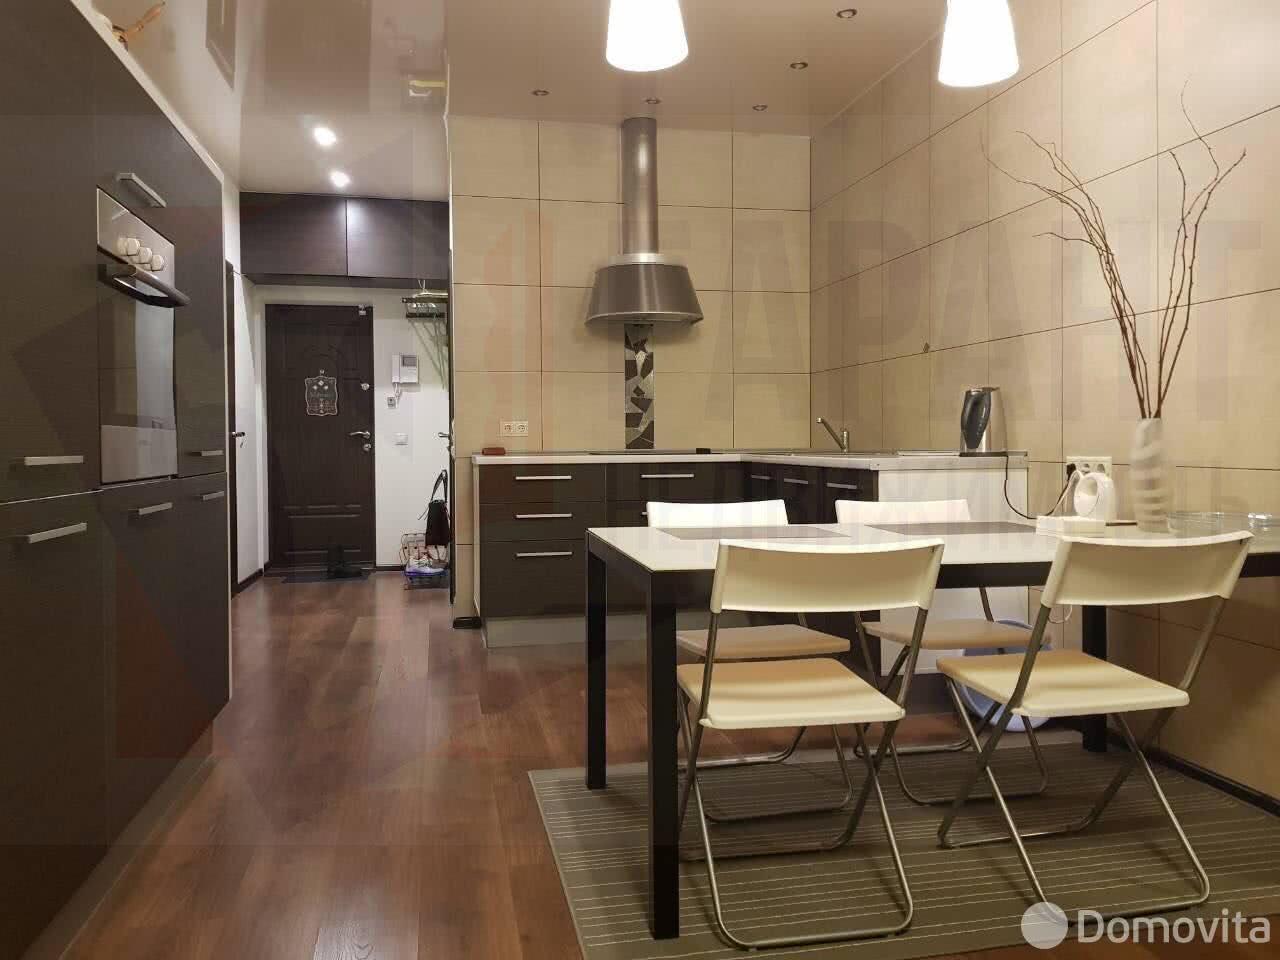 Аренда 2-комнатной квартиры в Минске, пр-т Независимости, д. 168 к2 - фото 3